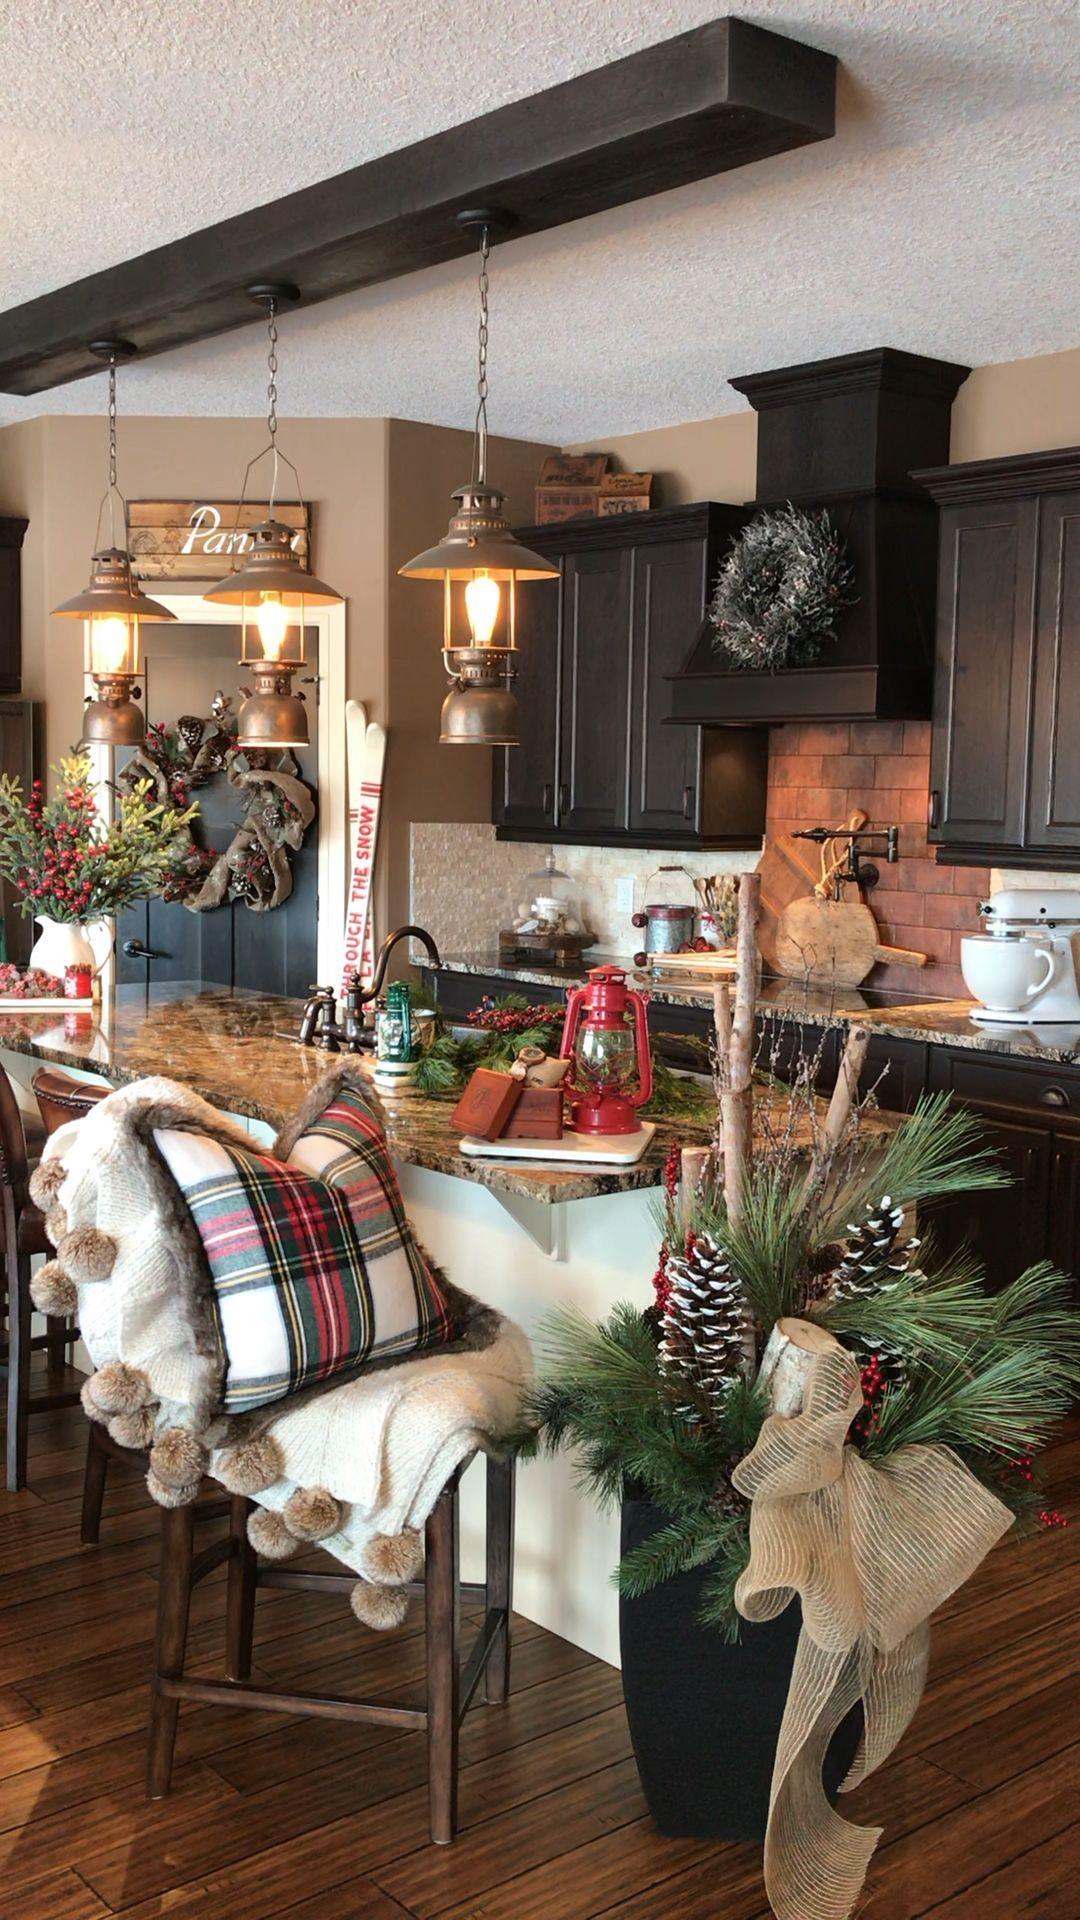 #farmhouse #rustic #rustichomedecor #kitchen #christmas #christmasdecor #house #lanterns #cozy #cozychristmas #holiday #holidaydecor #decor  #homedecor#farmhouse ##rustic ##rustichomedecor ##kitchen ##christmas ##christmasdecor ##house ##lanterns ##cozy ##cozychristmas ##holiday ##holidaydecor ##decor # ##homedecor #christmas